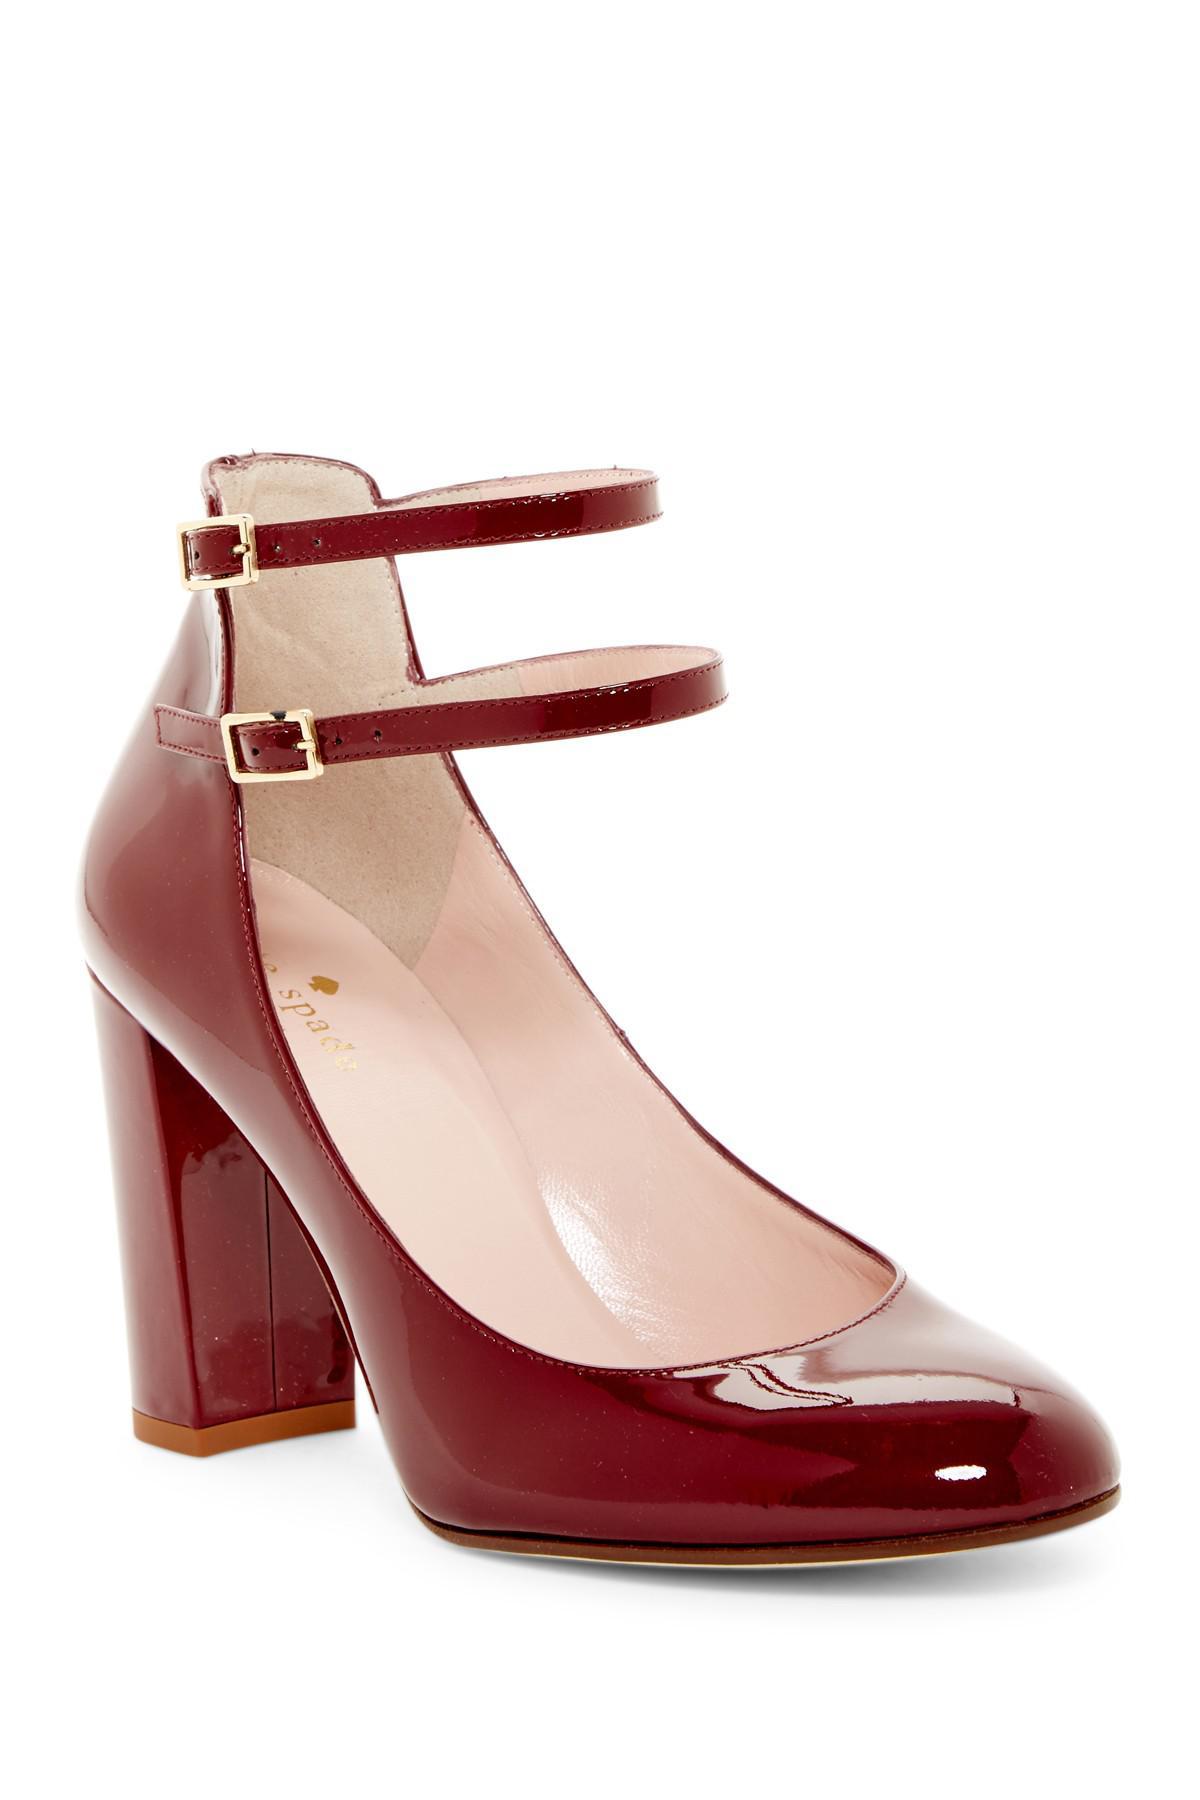 c678f5bac07f Lyst - Kate Spade Baneera Block Heel Pump in Red